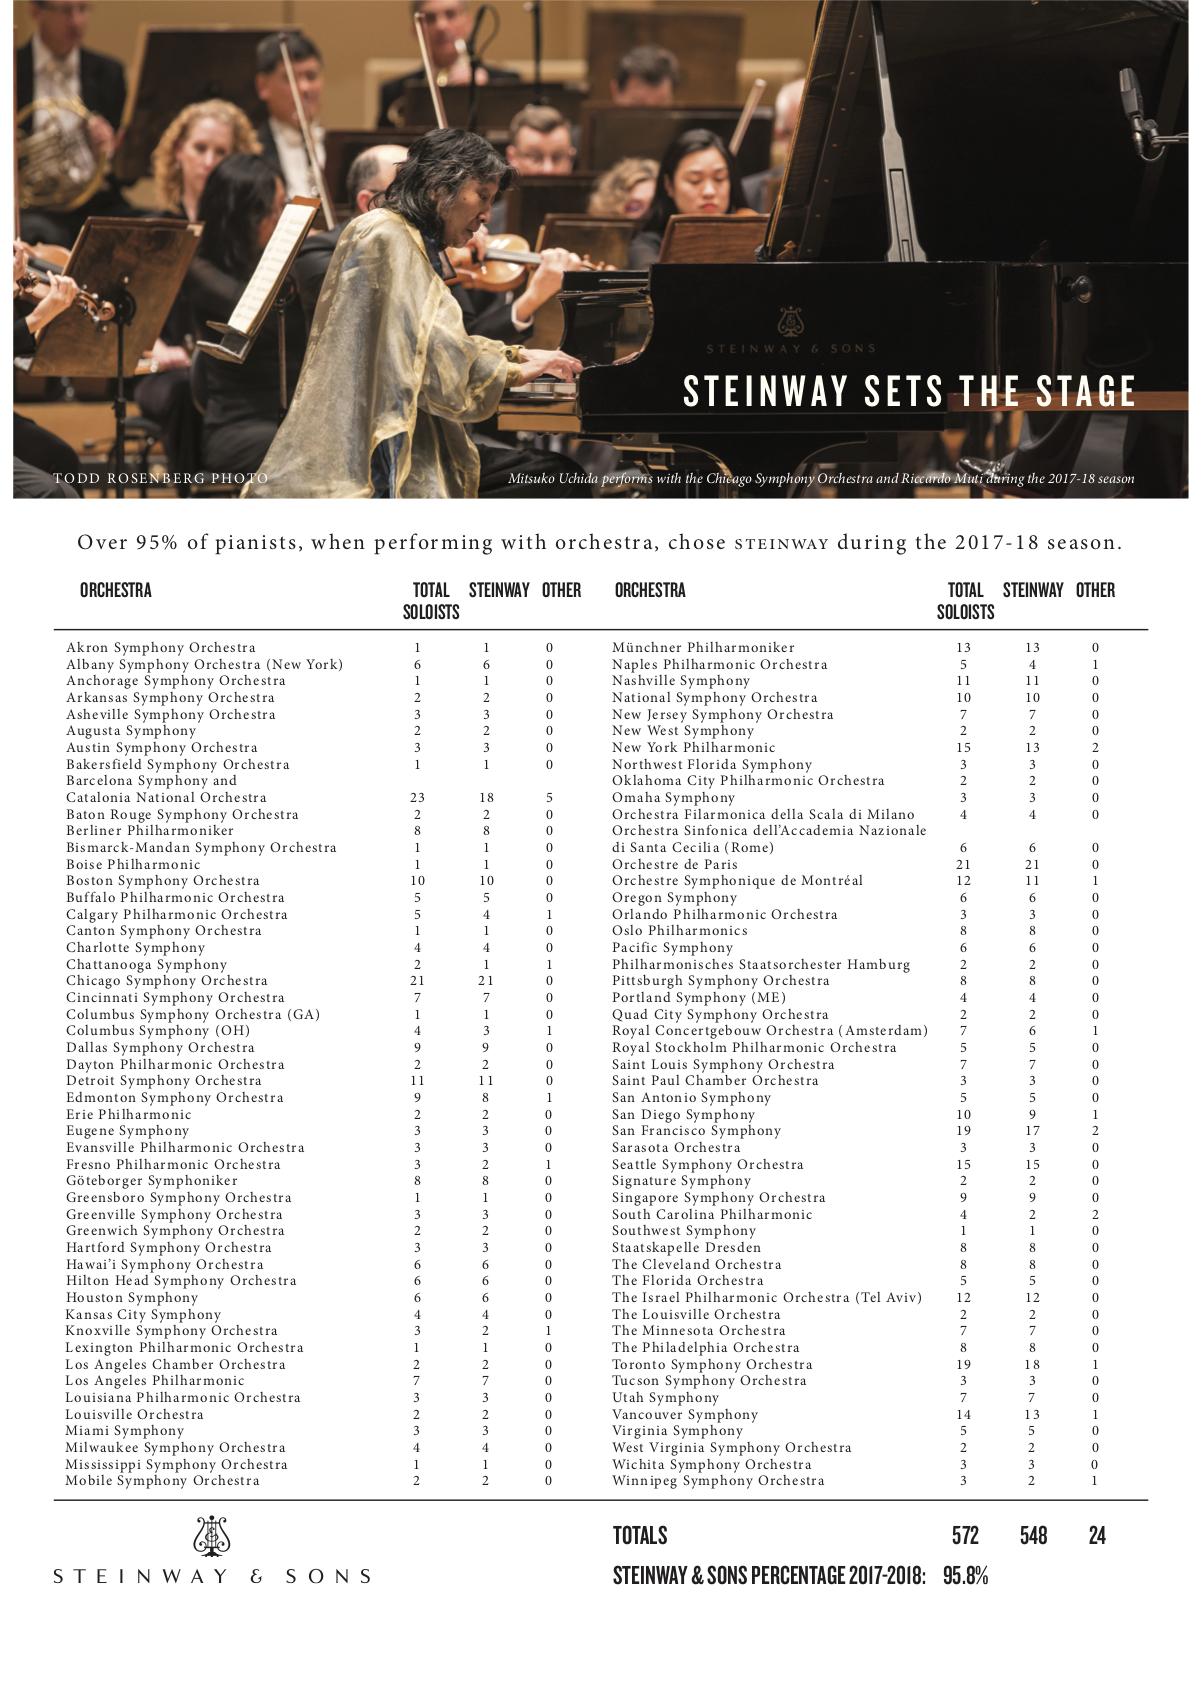 Steinway & Sons Symphony Survey - Steinway & Sons